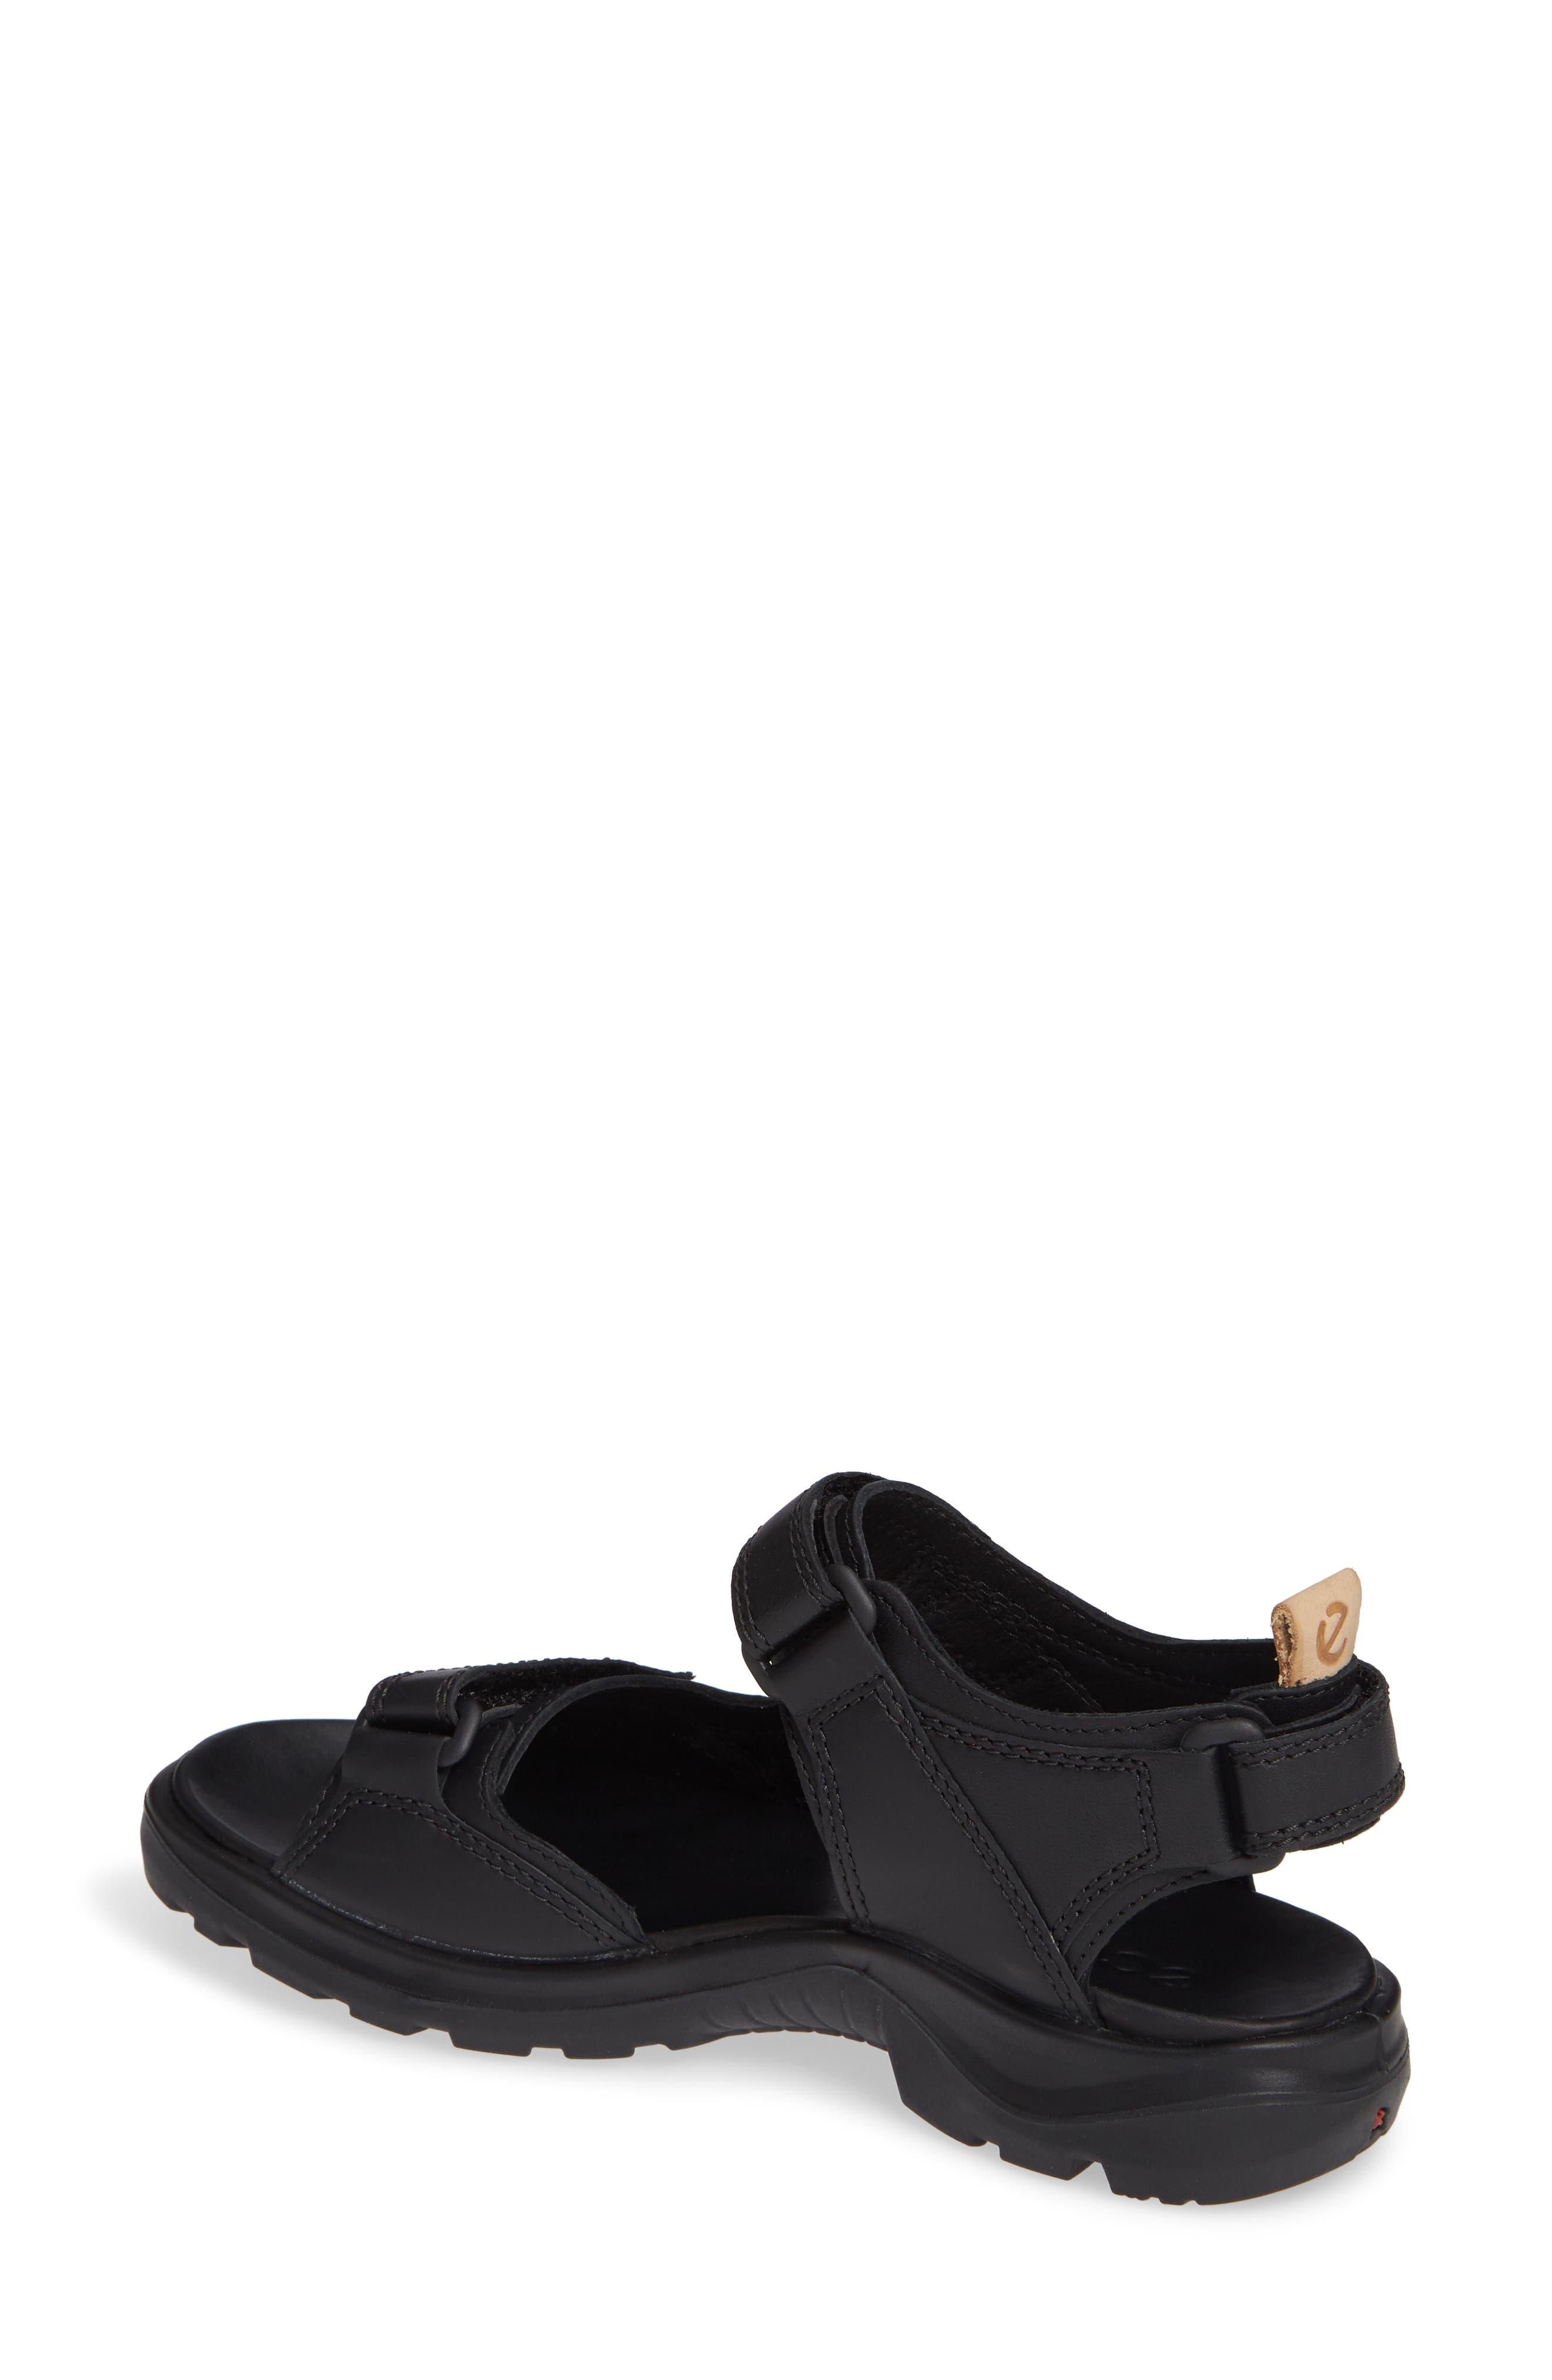 Premium Offroad Sandal,                             Alternate thumbnail 2, color,                             BLACK NUBUCK LEATHER